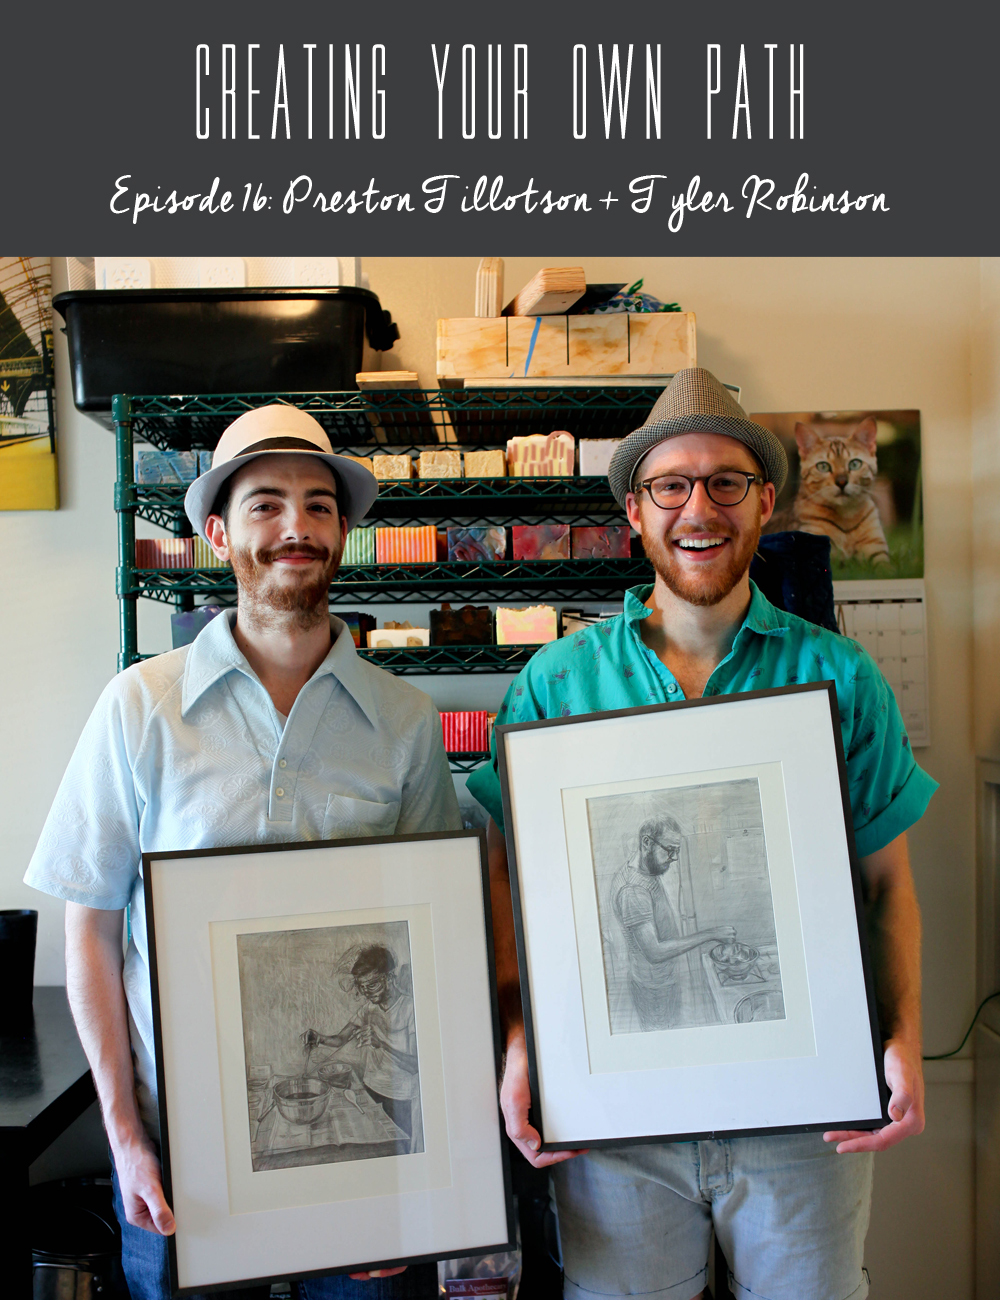 Preston Tillotson and Tyler Robinson of Sudz by Studz.